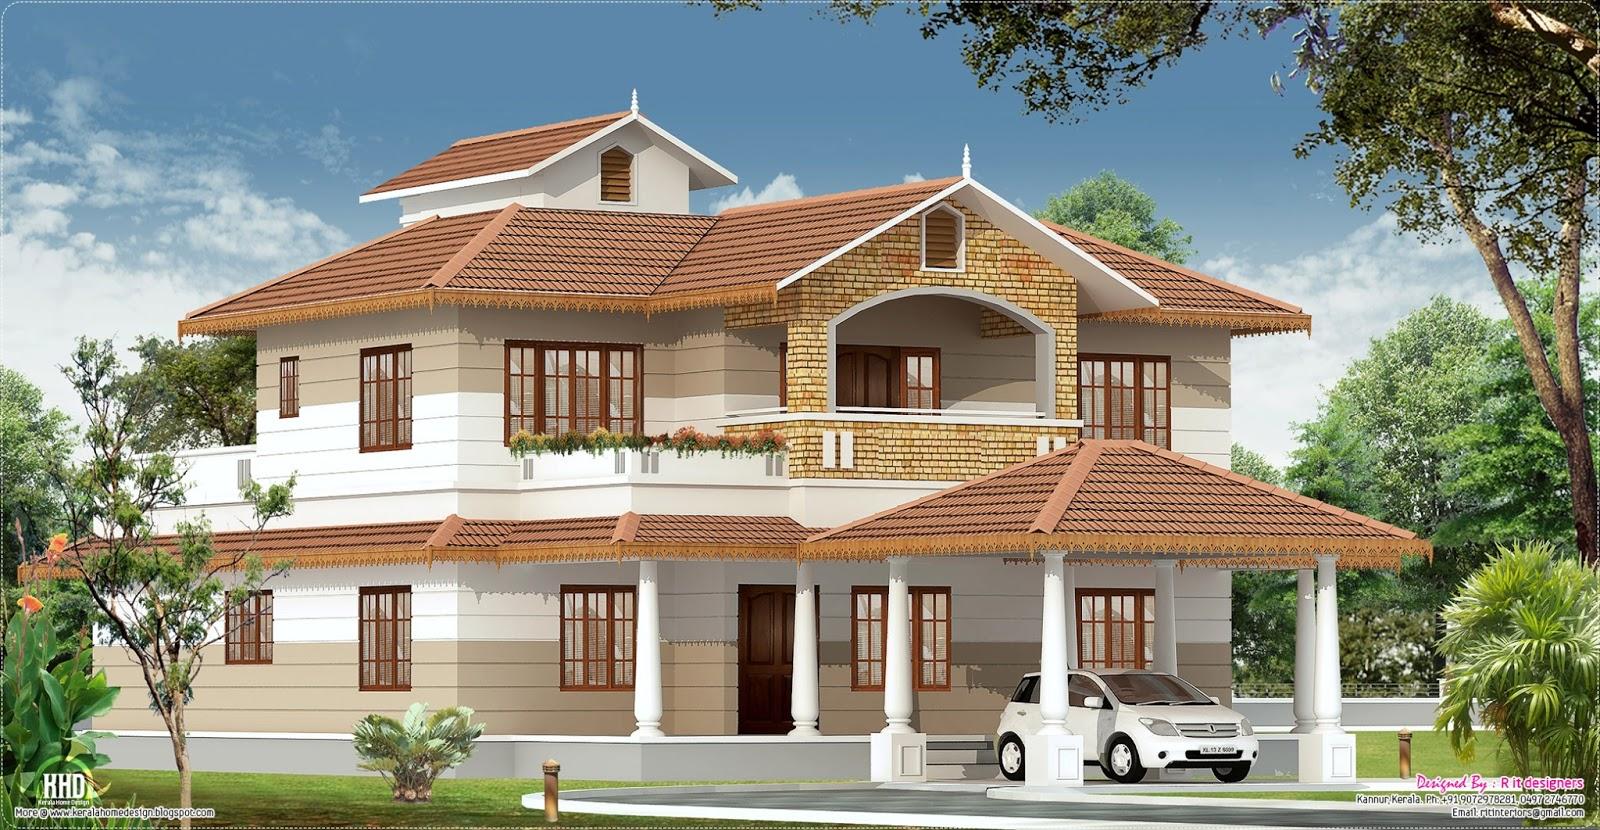 kerala home interior designs kerala home design floor plans planhouse house plans home plans plan designers simple planhouse